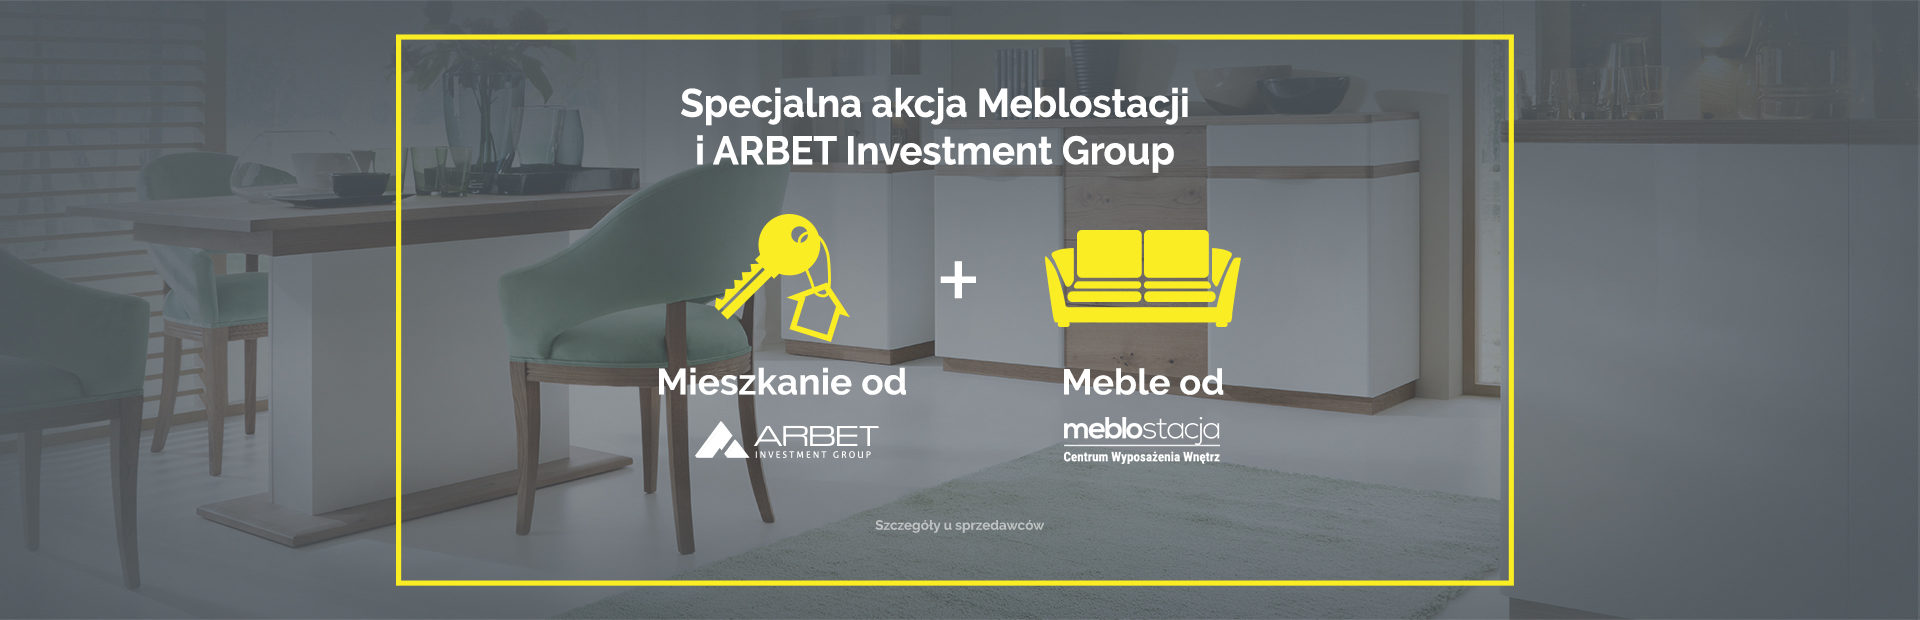 Mieszkanie od ARBET-u, meble od Meblostacji